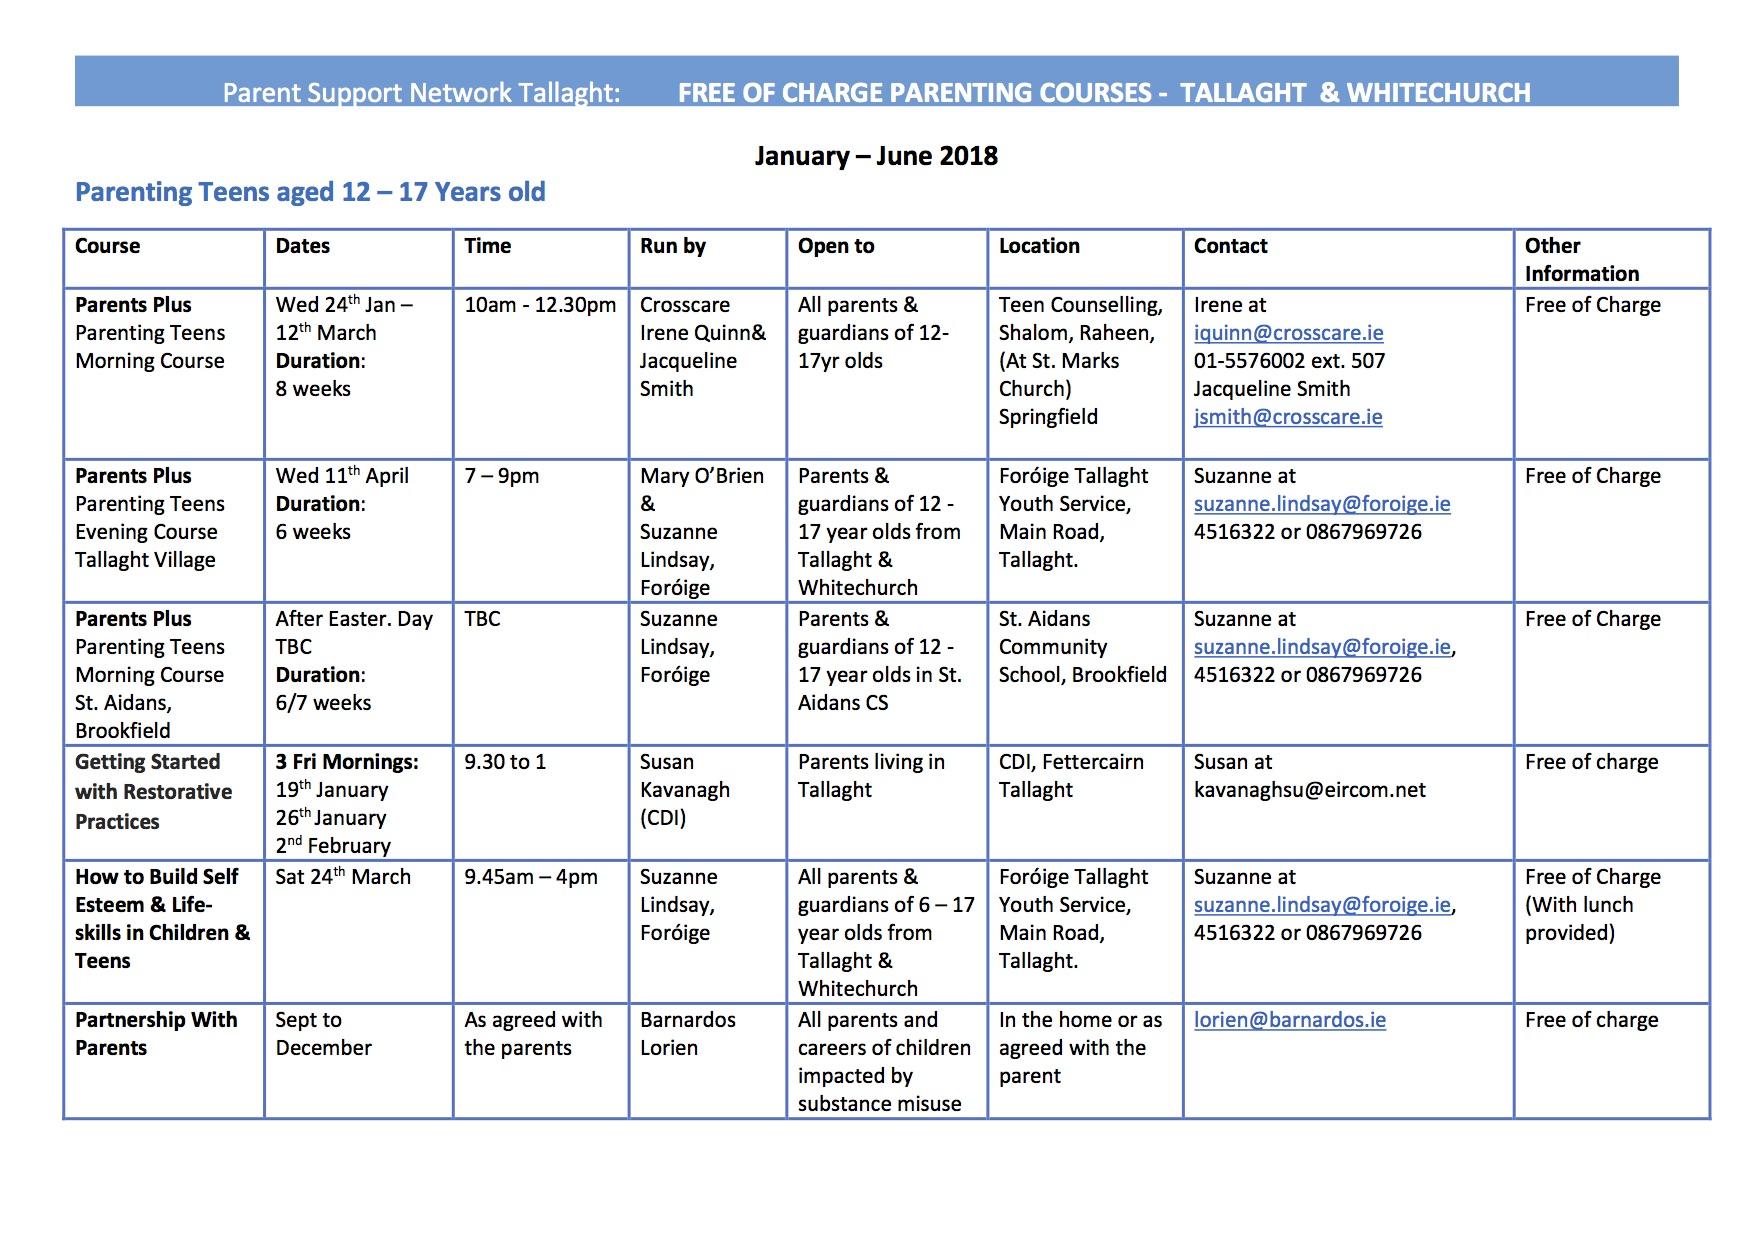 2018 Calendar PSNT Parent Courses Jan - June.jpg